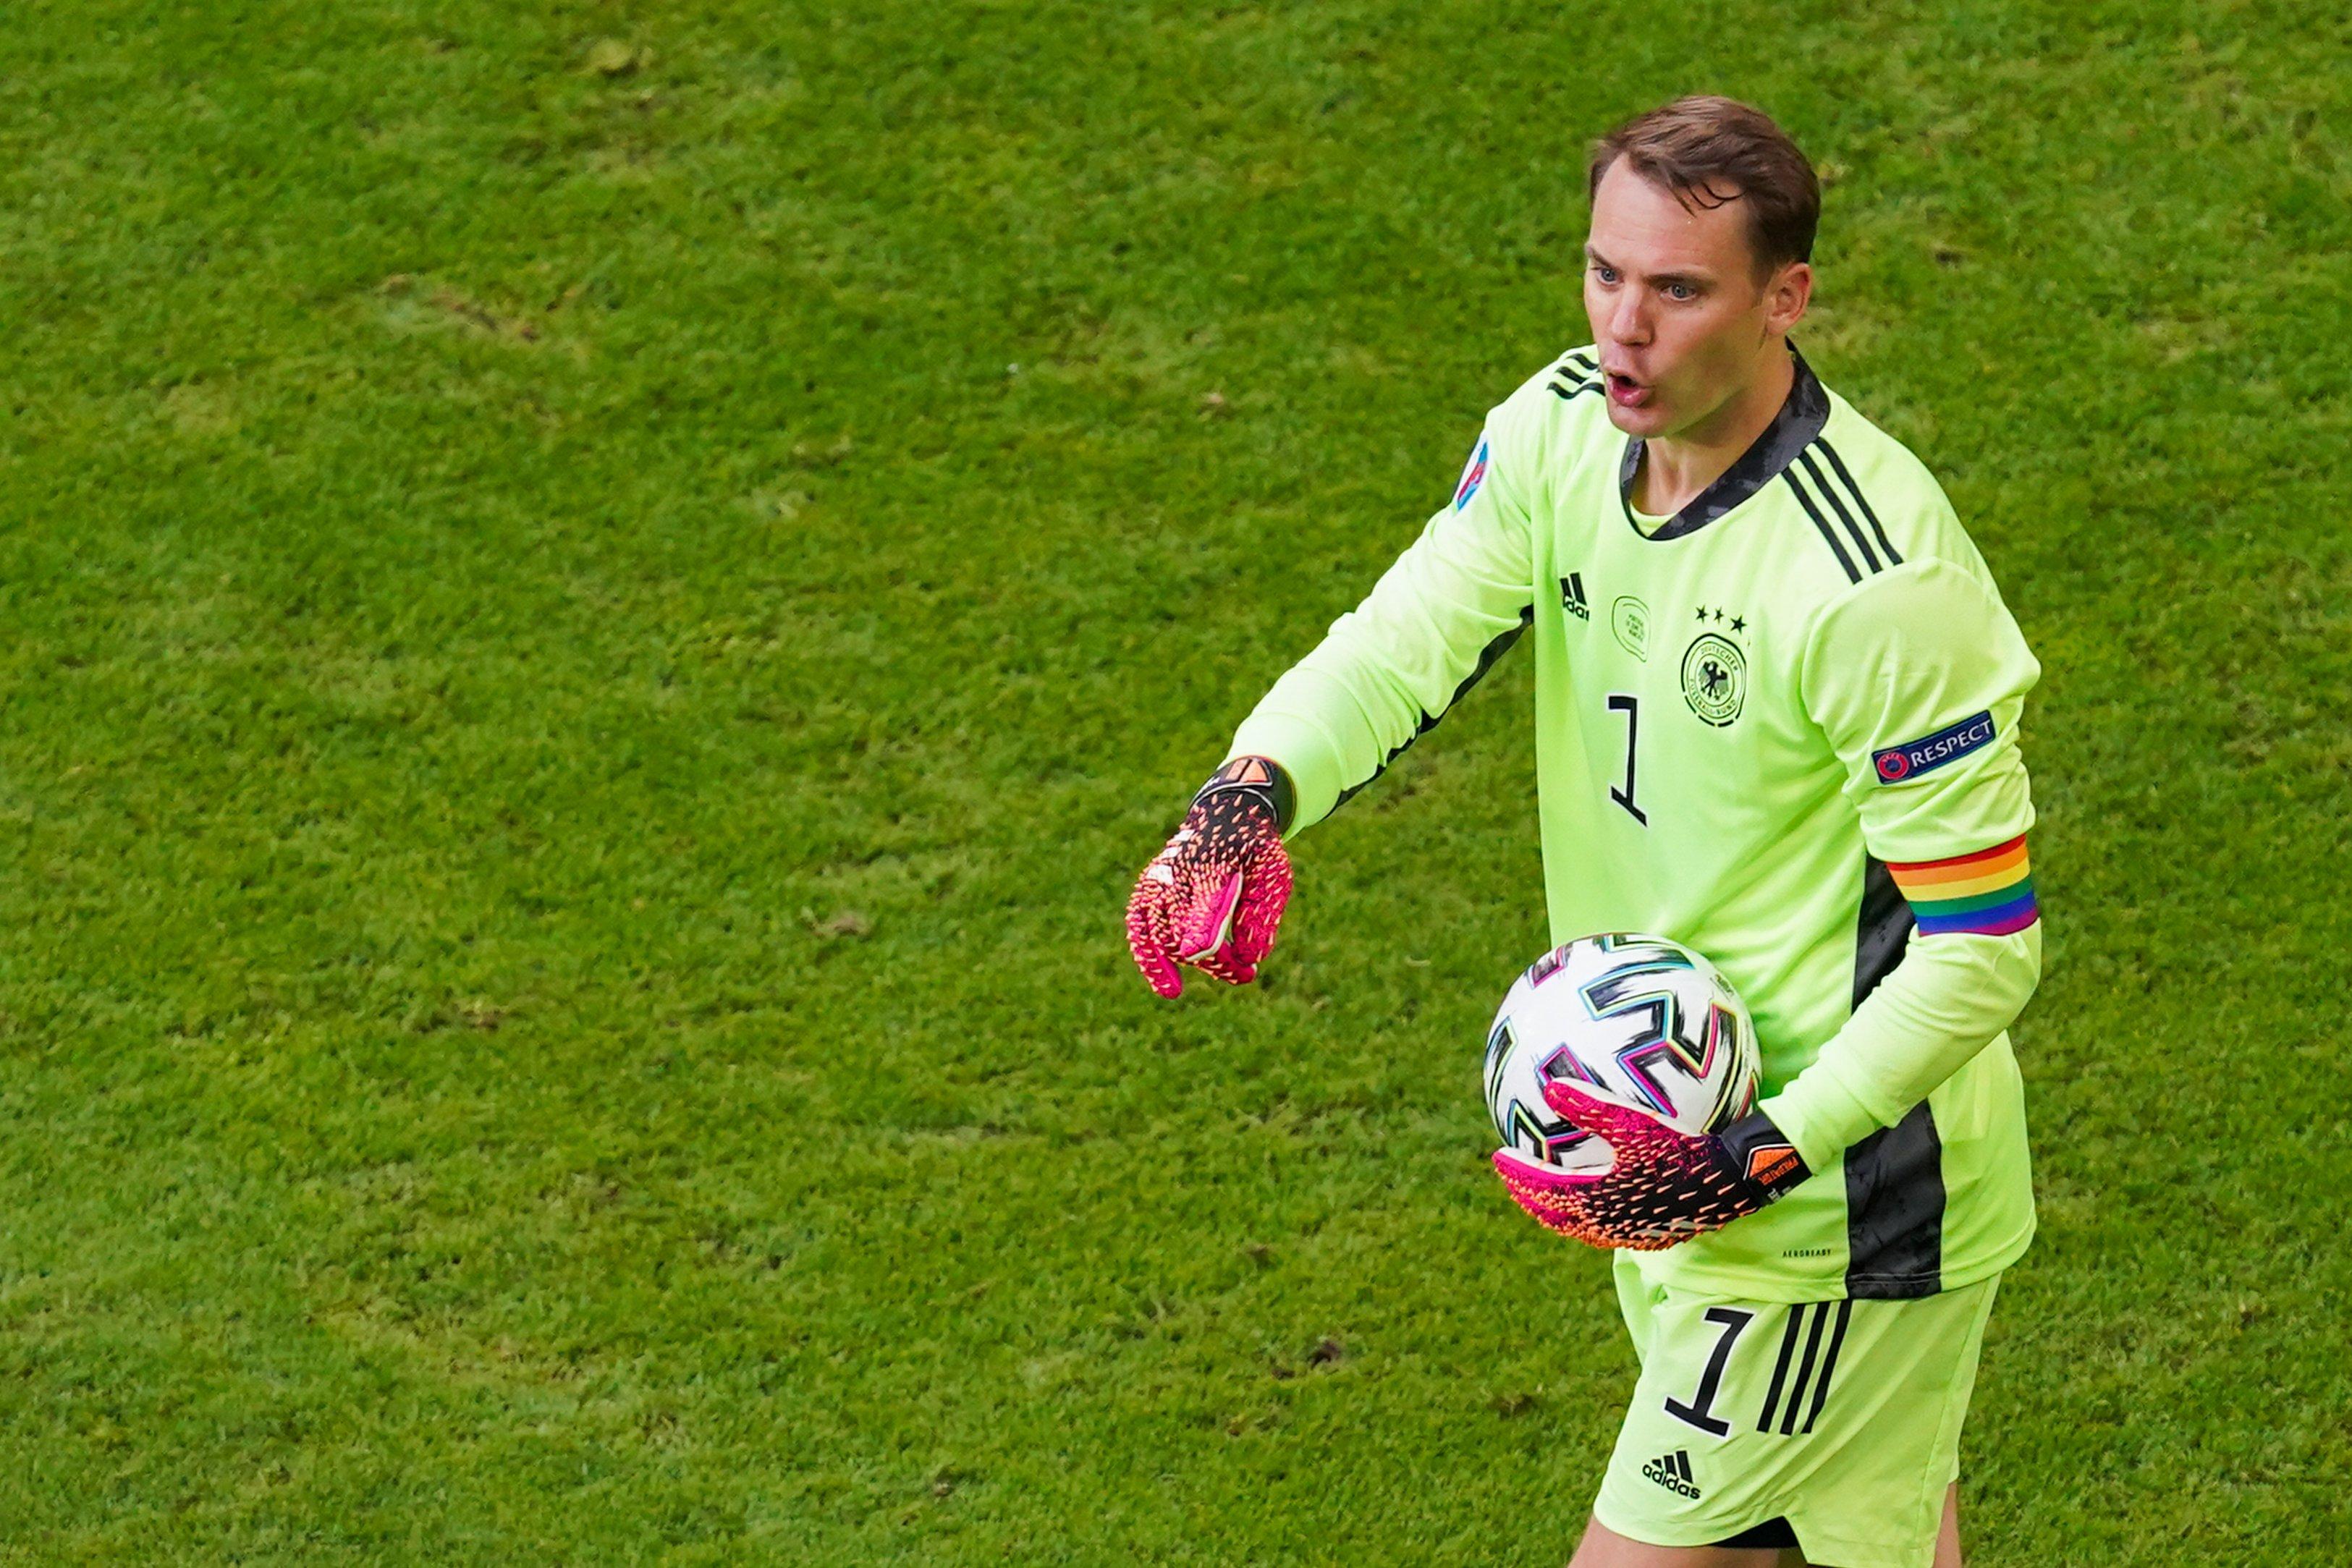 Portugal v Germany - UEFA Euro 2020 Group F